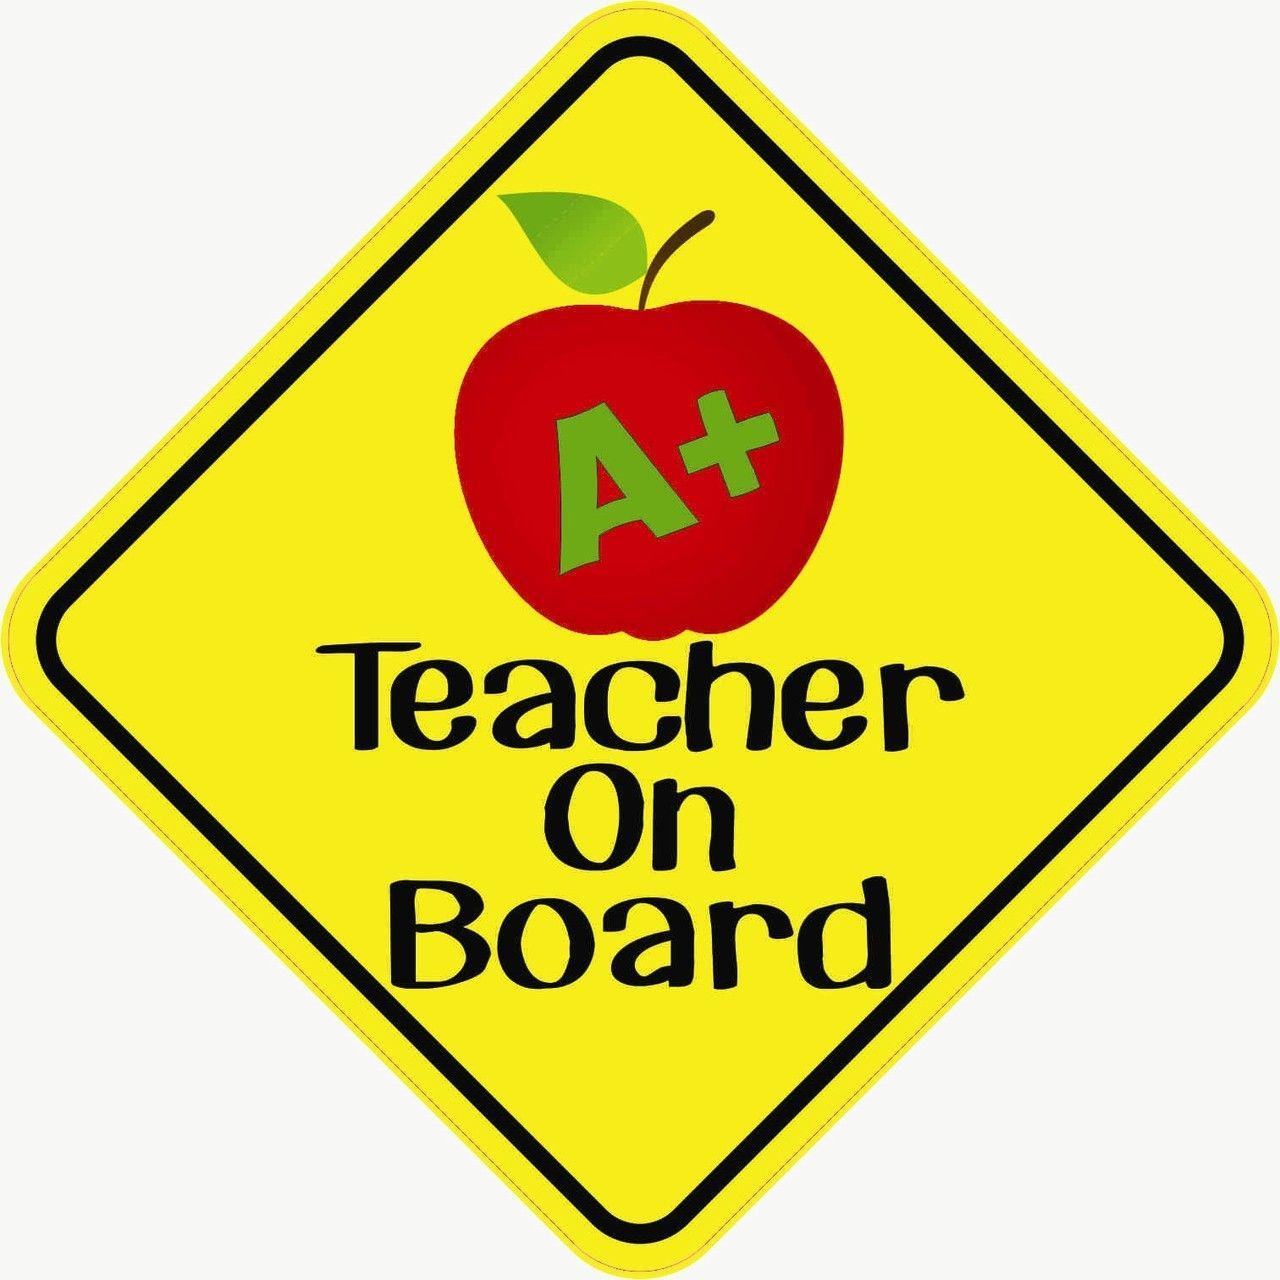 X Teacher On Board Bumper Sticker Decal Window Vinyl - Vinyl decal car signs